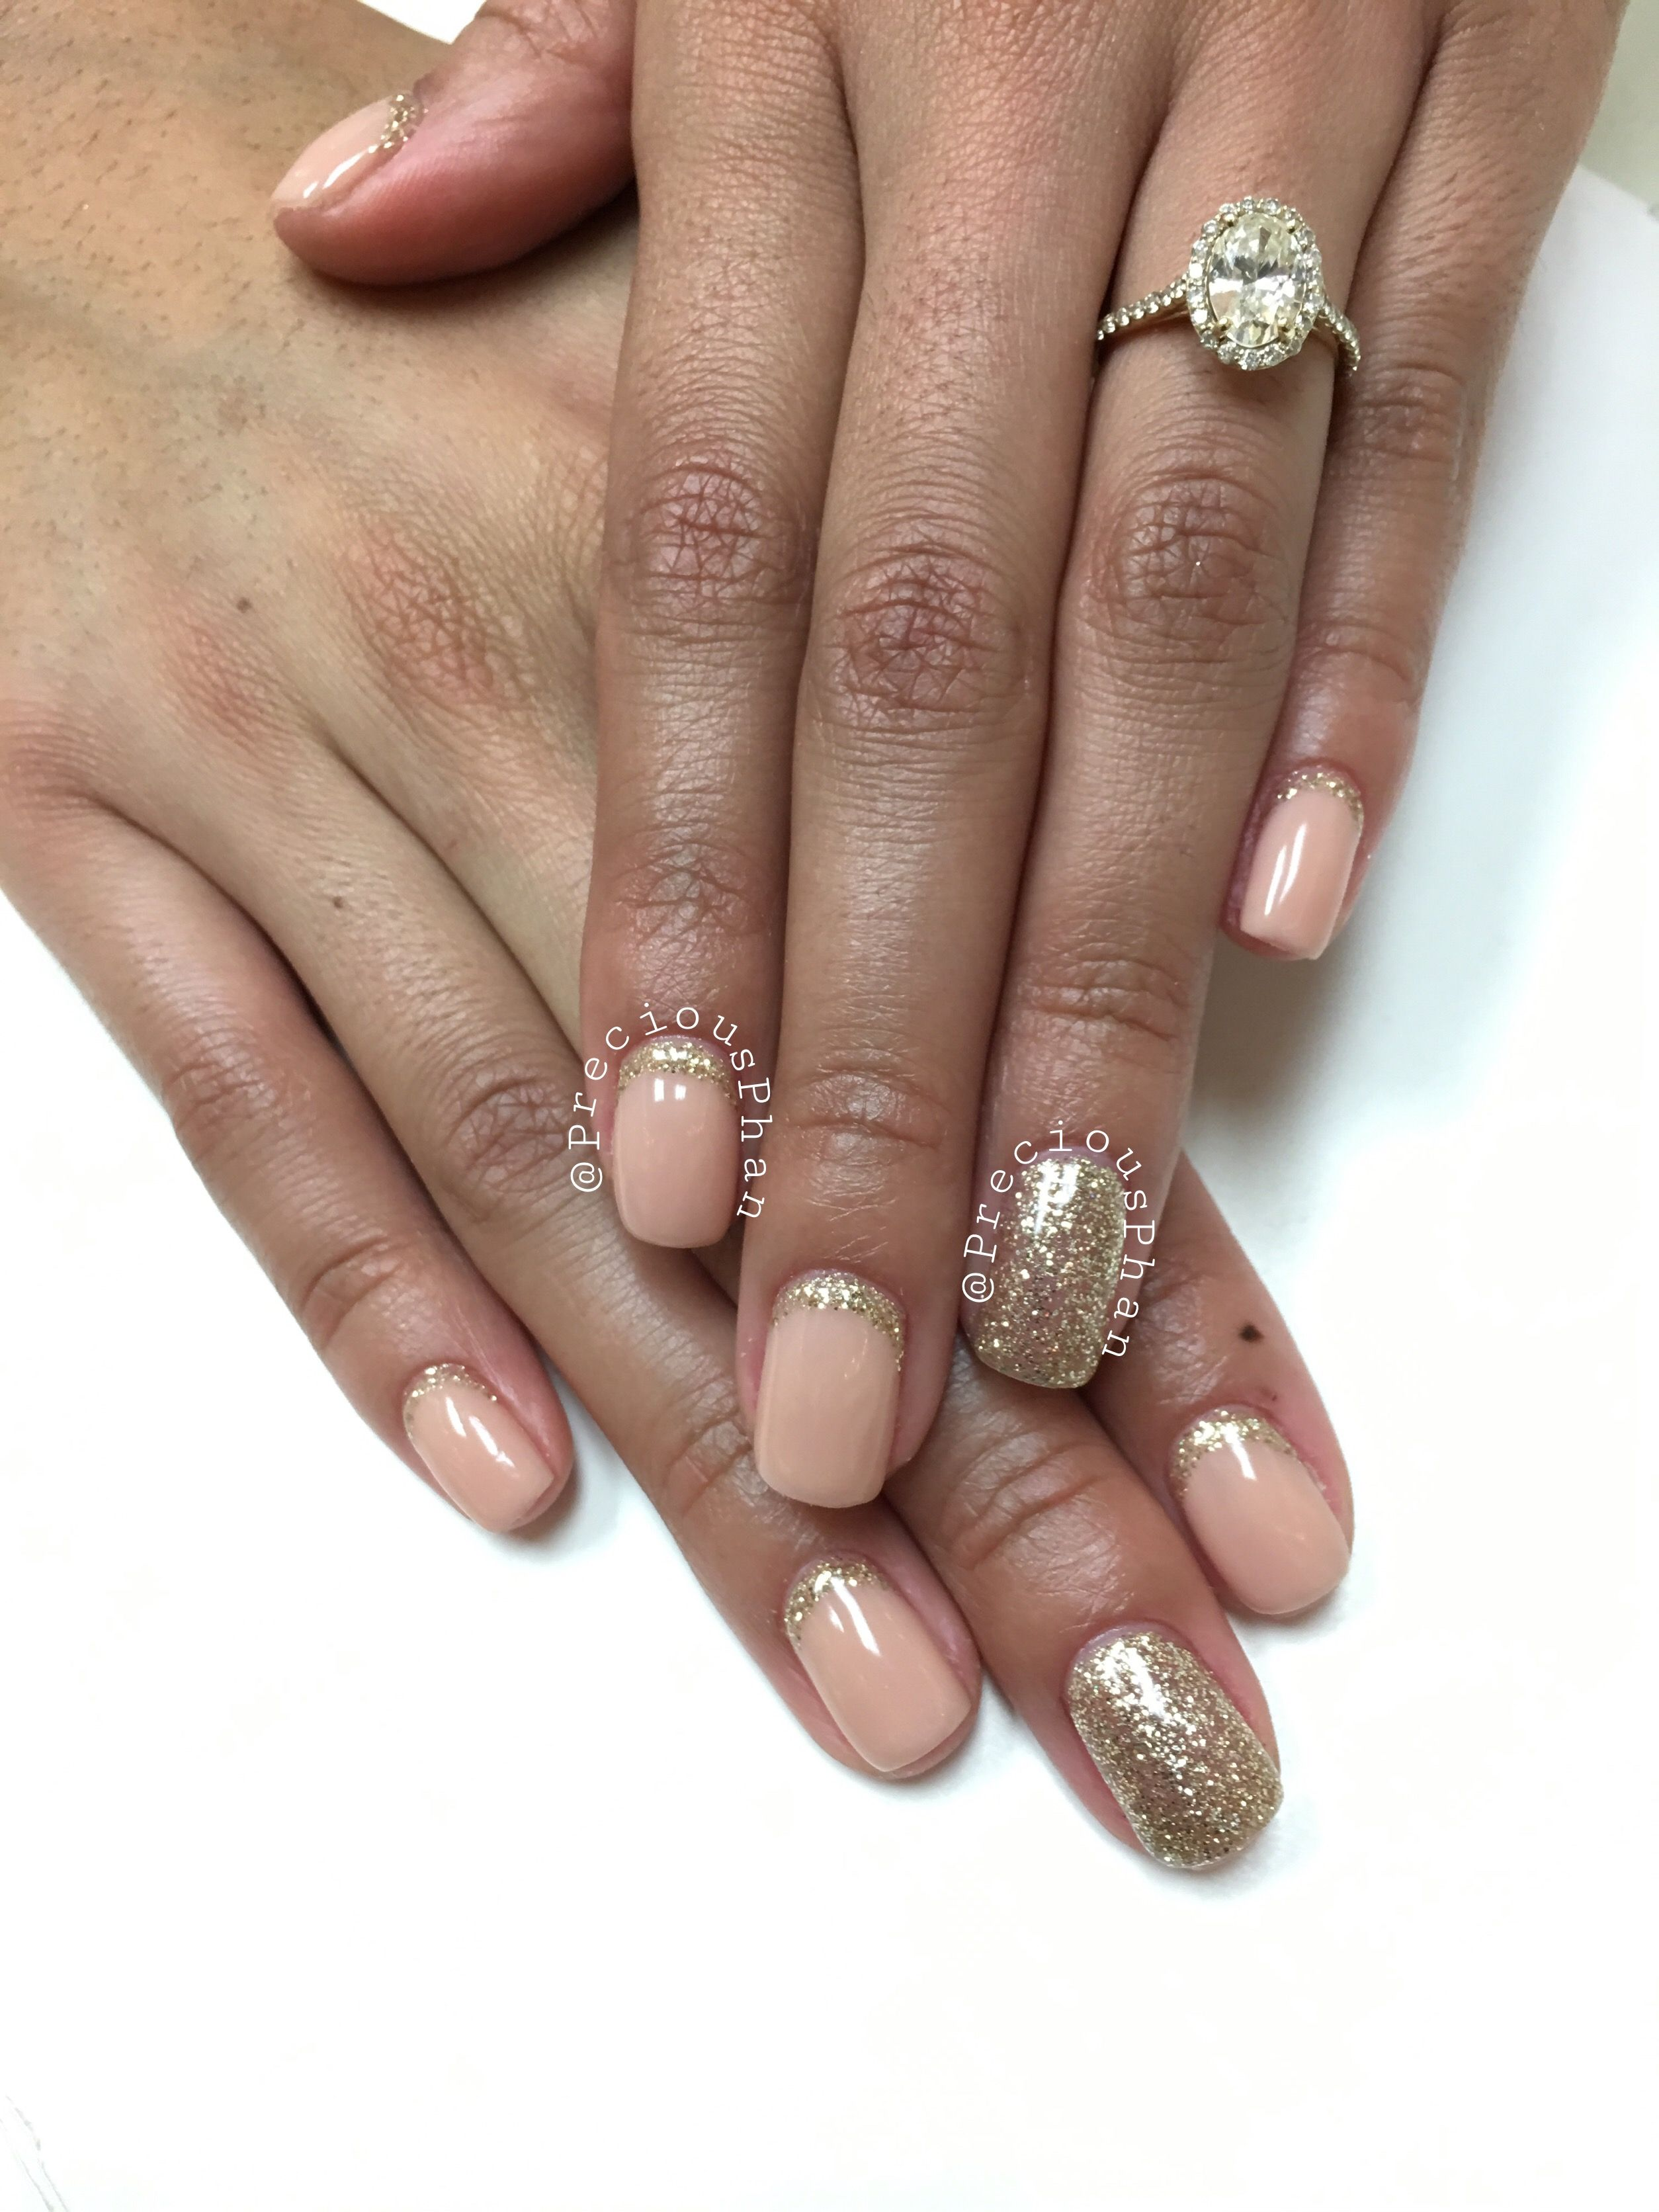 Nude nails with light gold nails. New year nails. #PreciousPhan